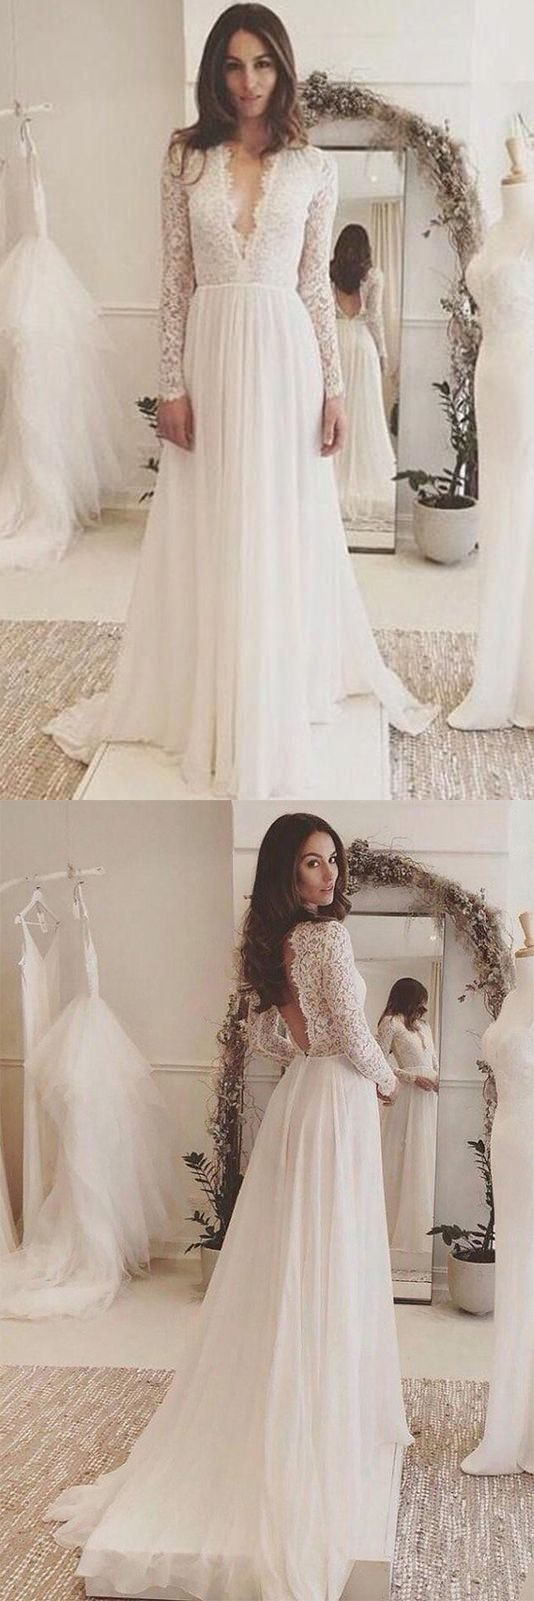 Off white chiffon long sleeves wedding dresssimple a line v neck